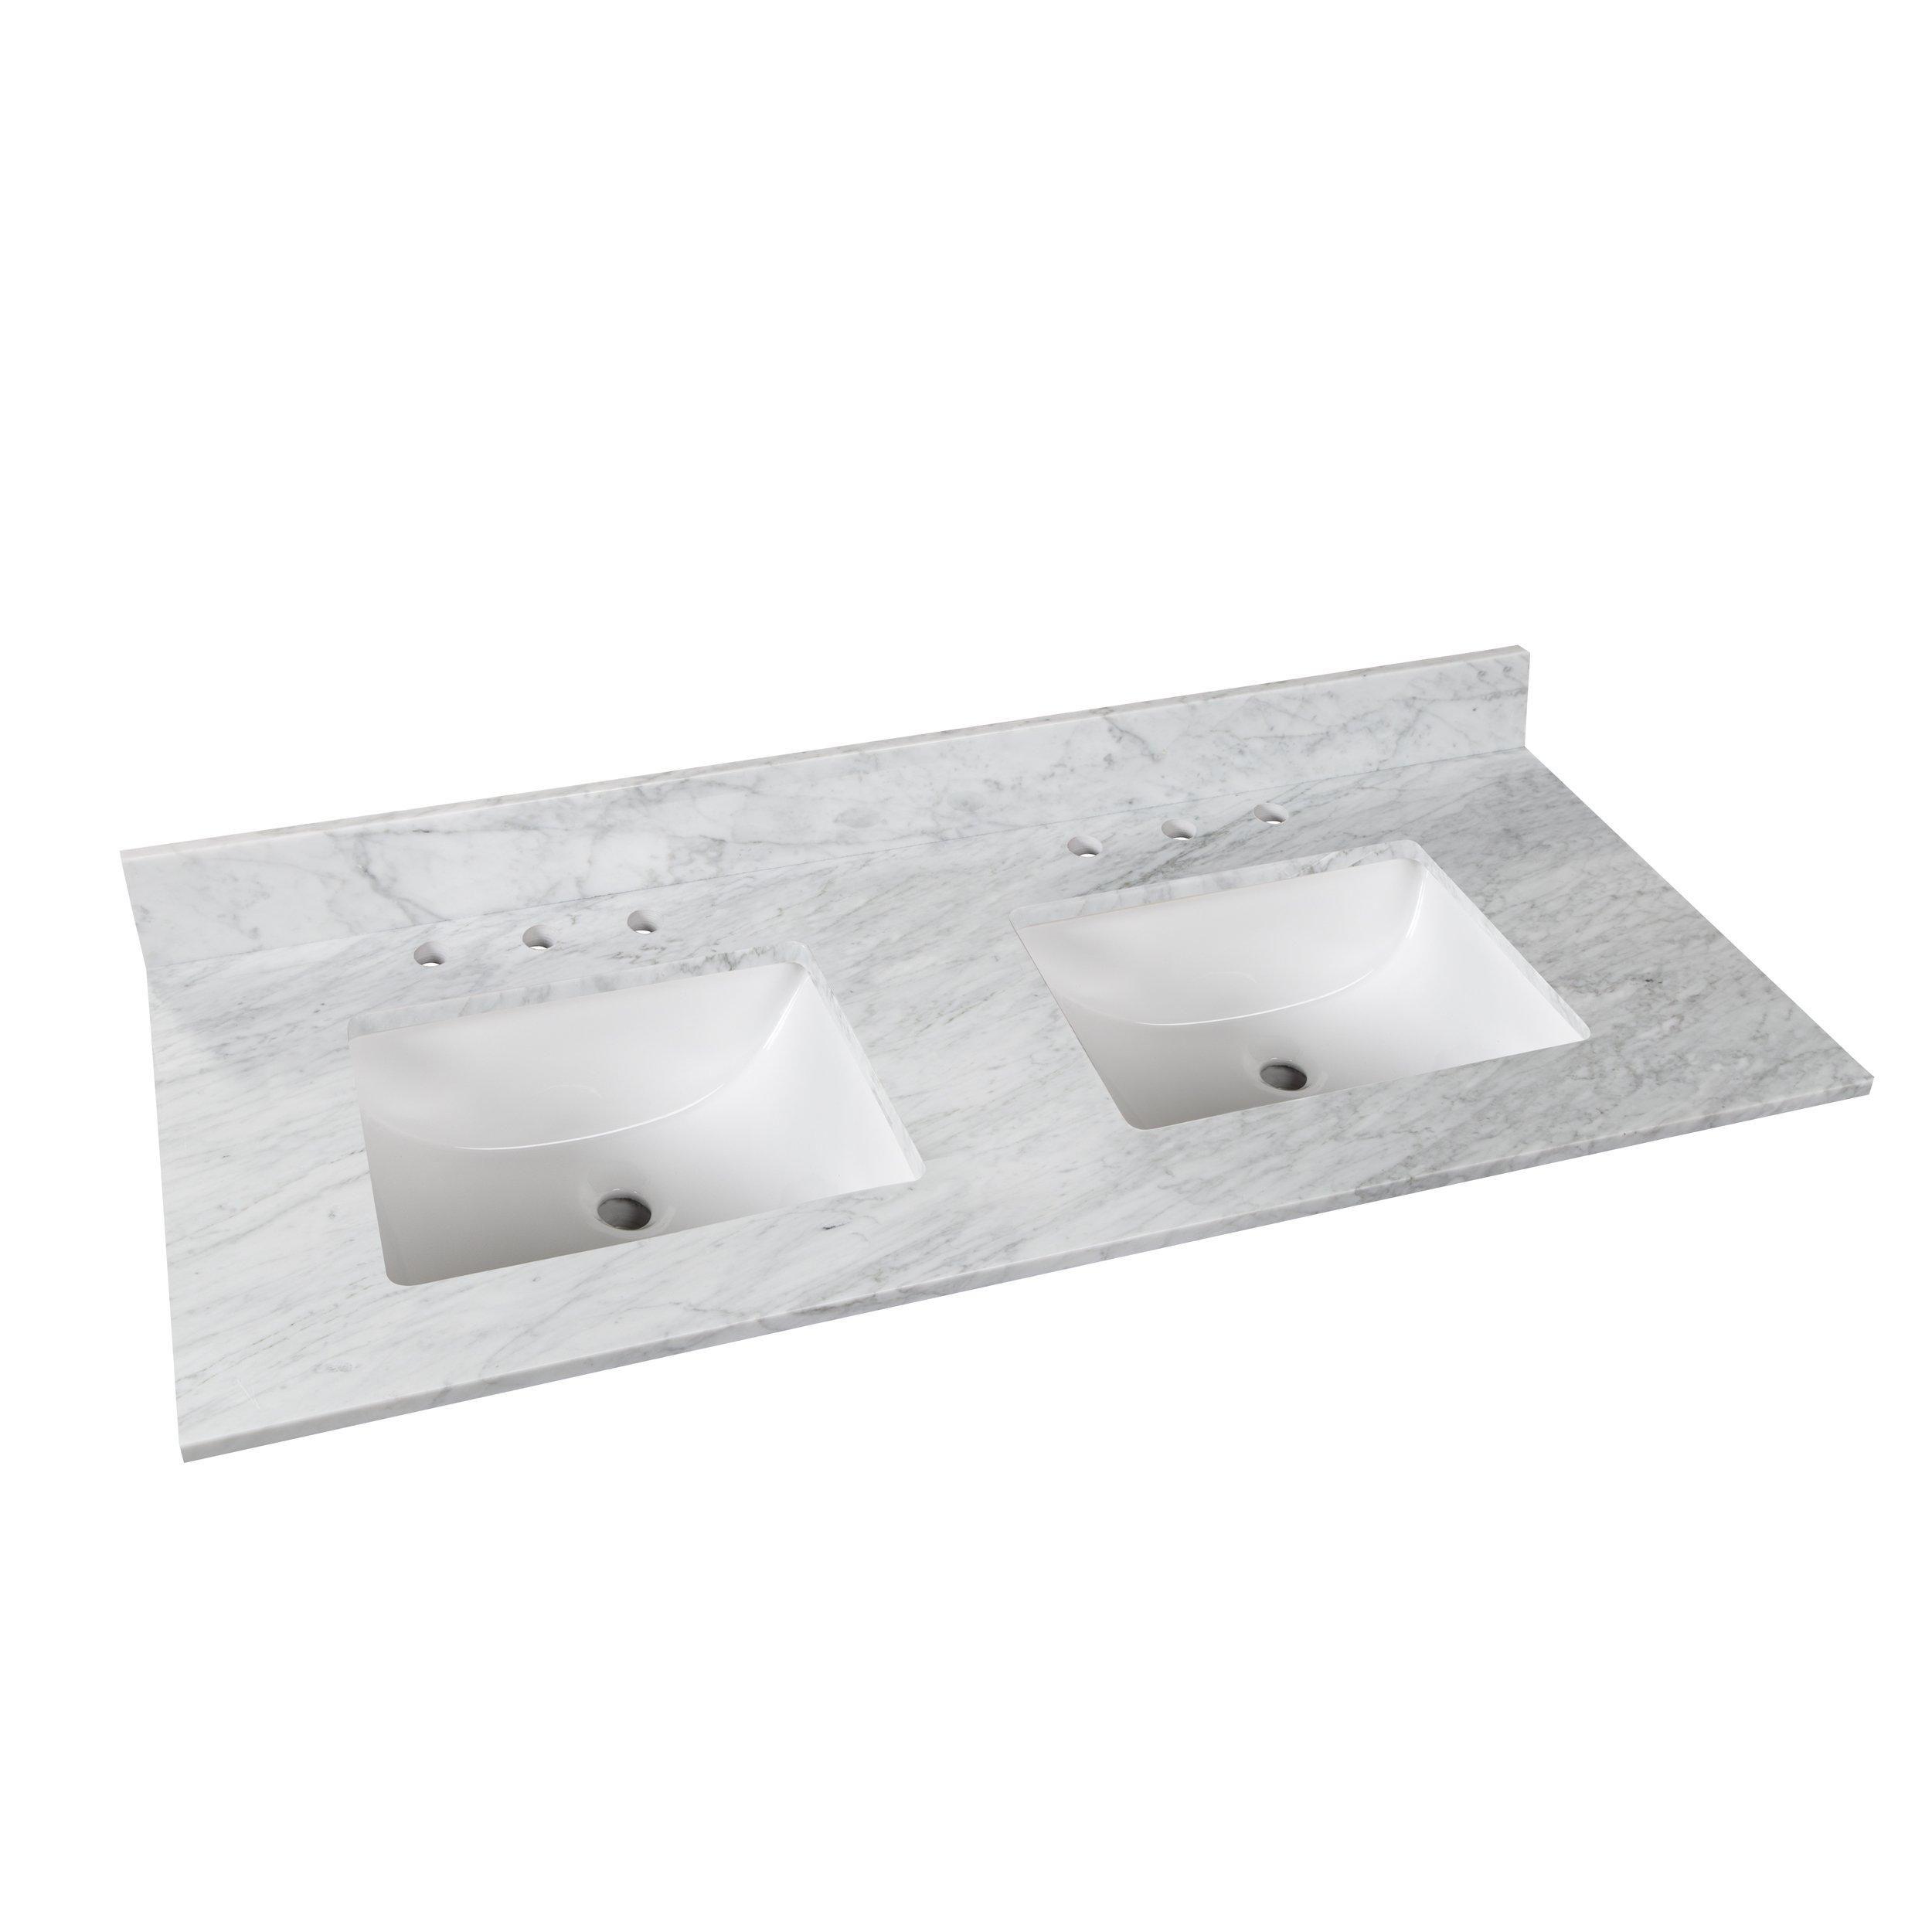 Bianco Carrara Marble 61 In Vanity Top Carrara Marble Polished Porcelain Tiles Carrara